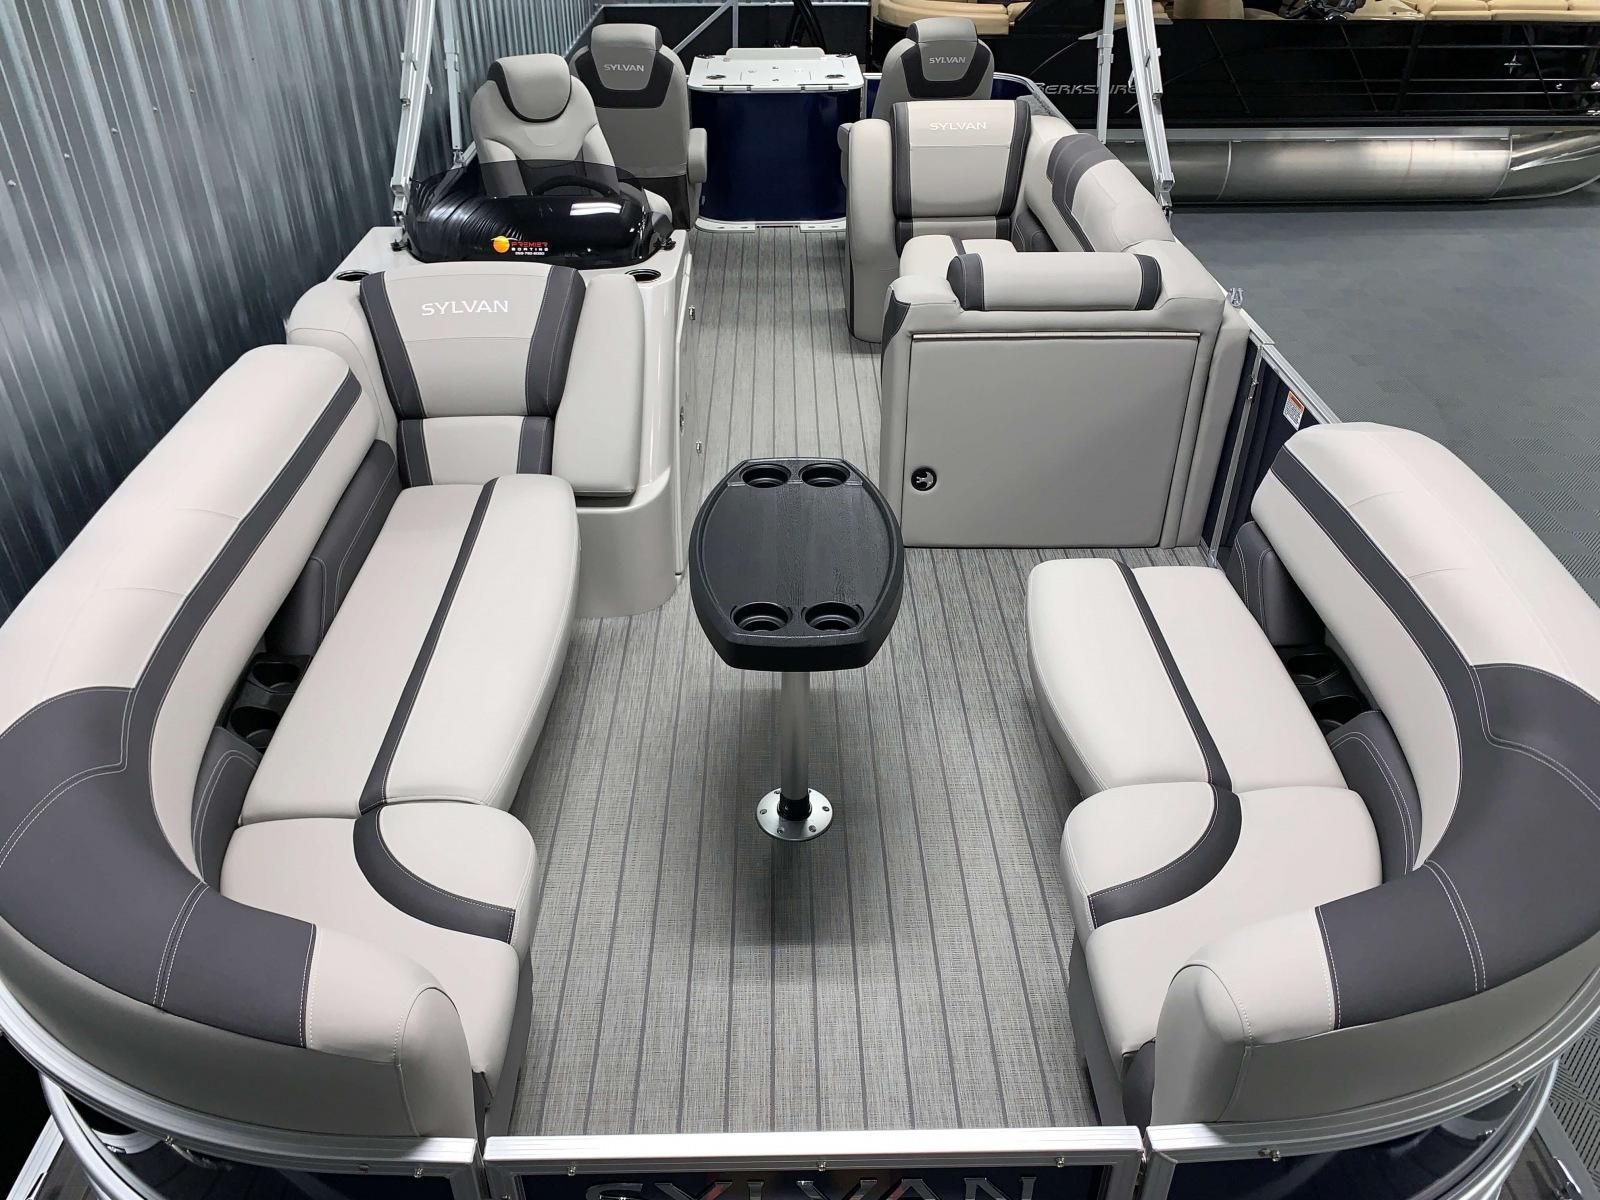 Interior Layout of the 2022 Sylvan L3 Party Fish Pontoon Boat